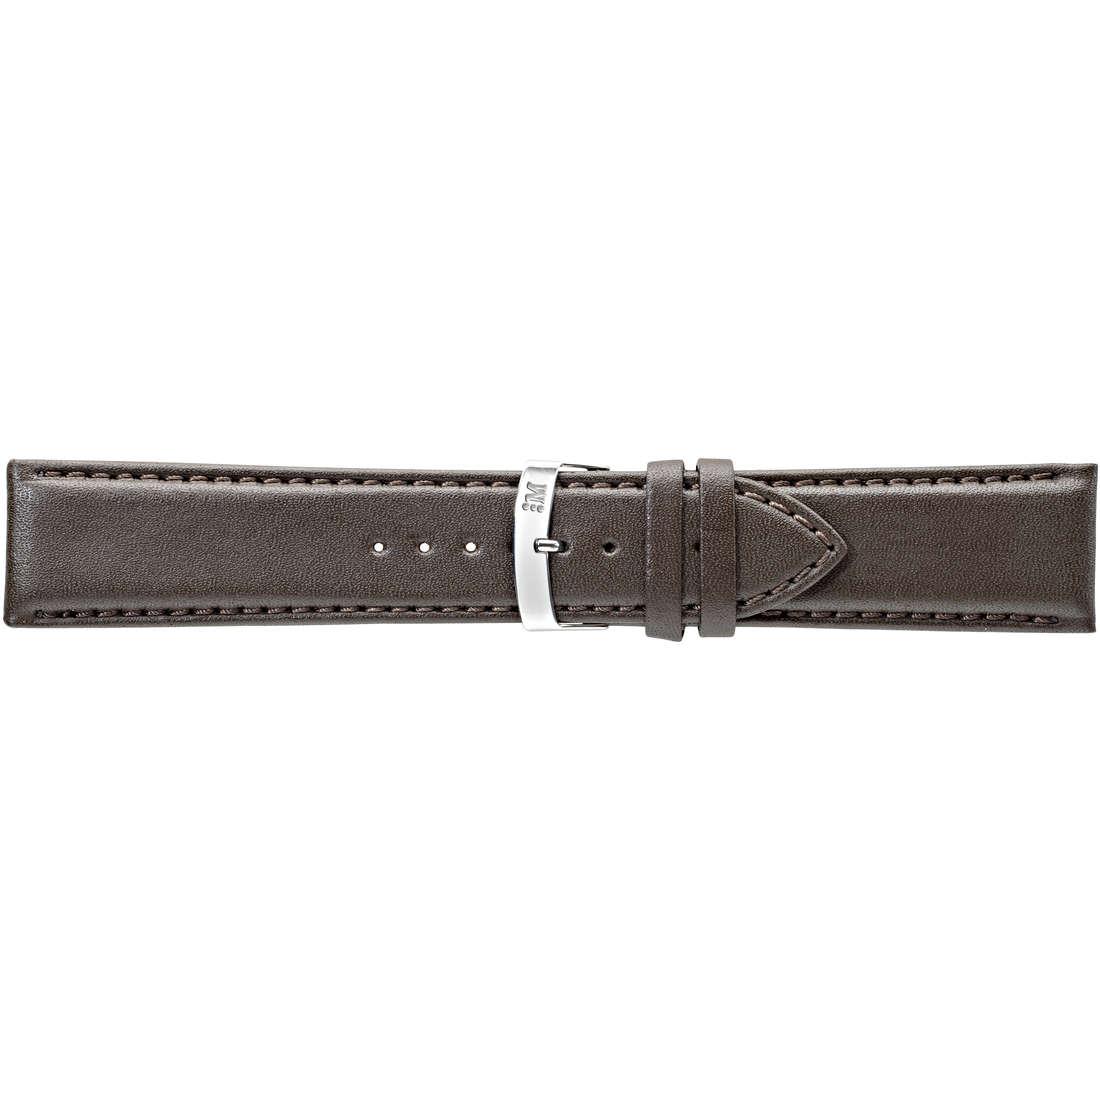 watch watch bands watch straps man Morellato Morellato 1930 A01X3395875032CR28